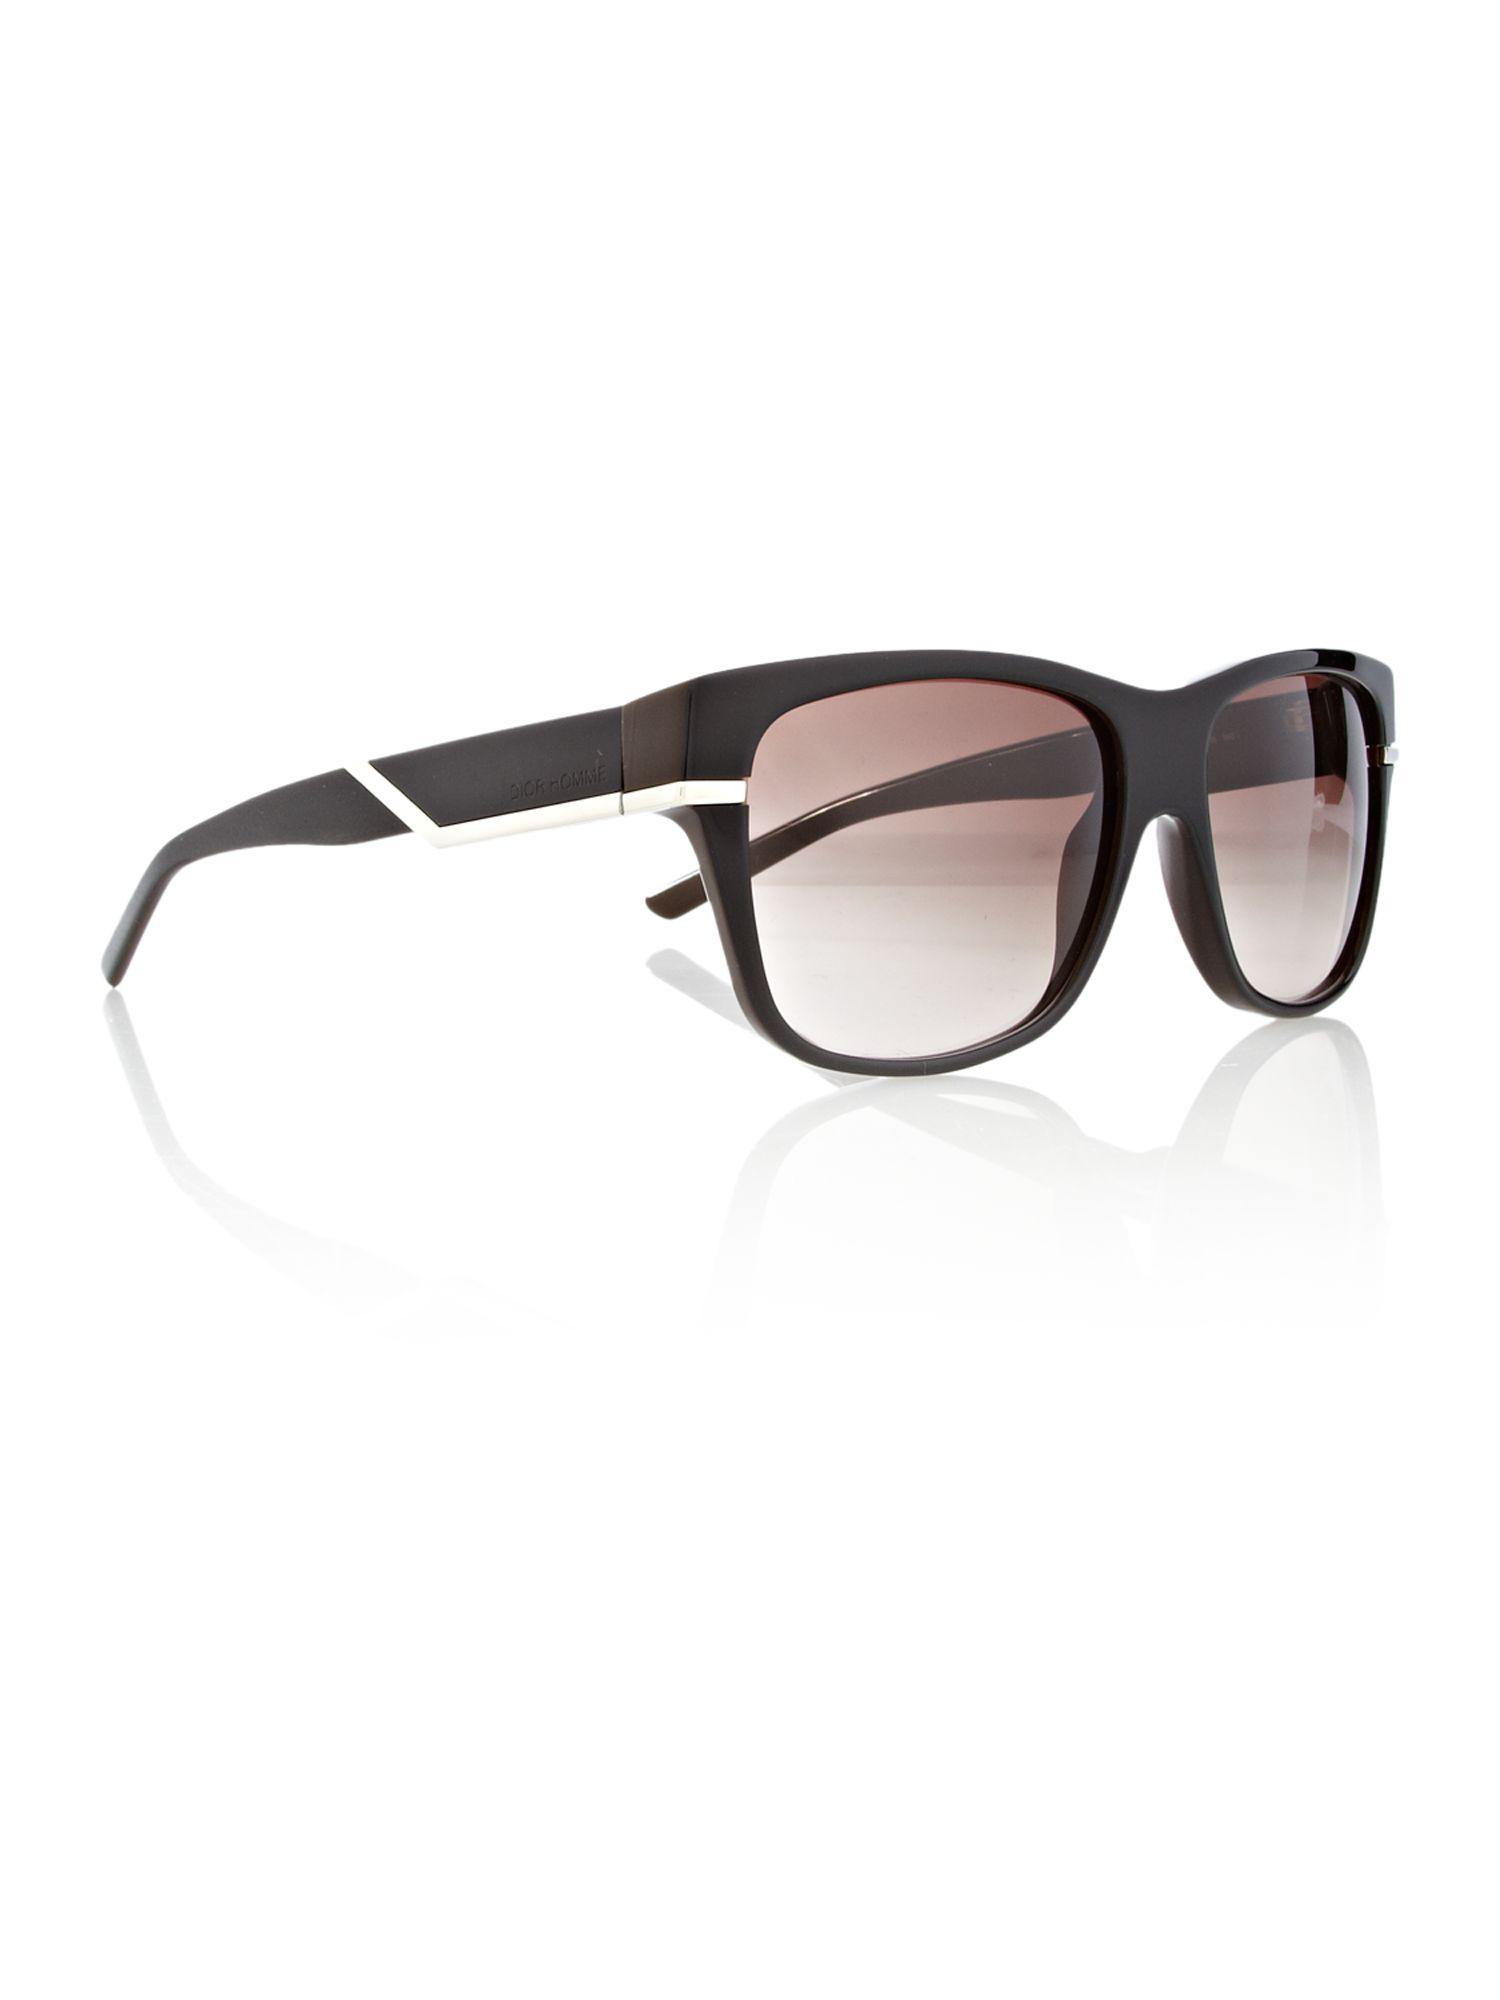 e5d64b091d8 Dior Sunglasses Black And Red. CHRISTIAN DIOR Cannage Dior Lady Lady 1  Sunglasses Black Red 188072